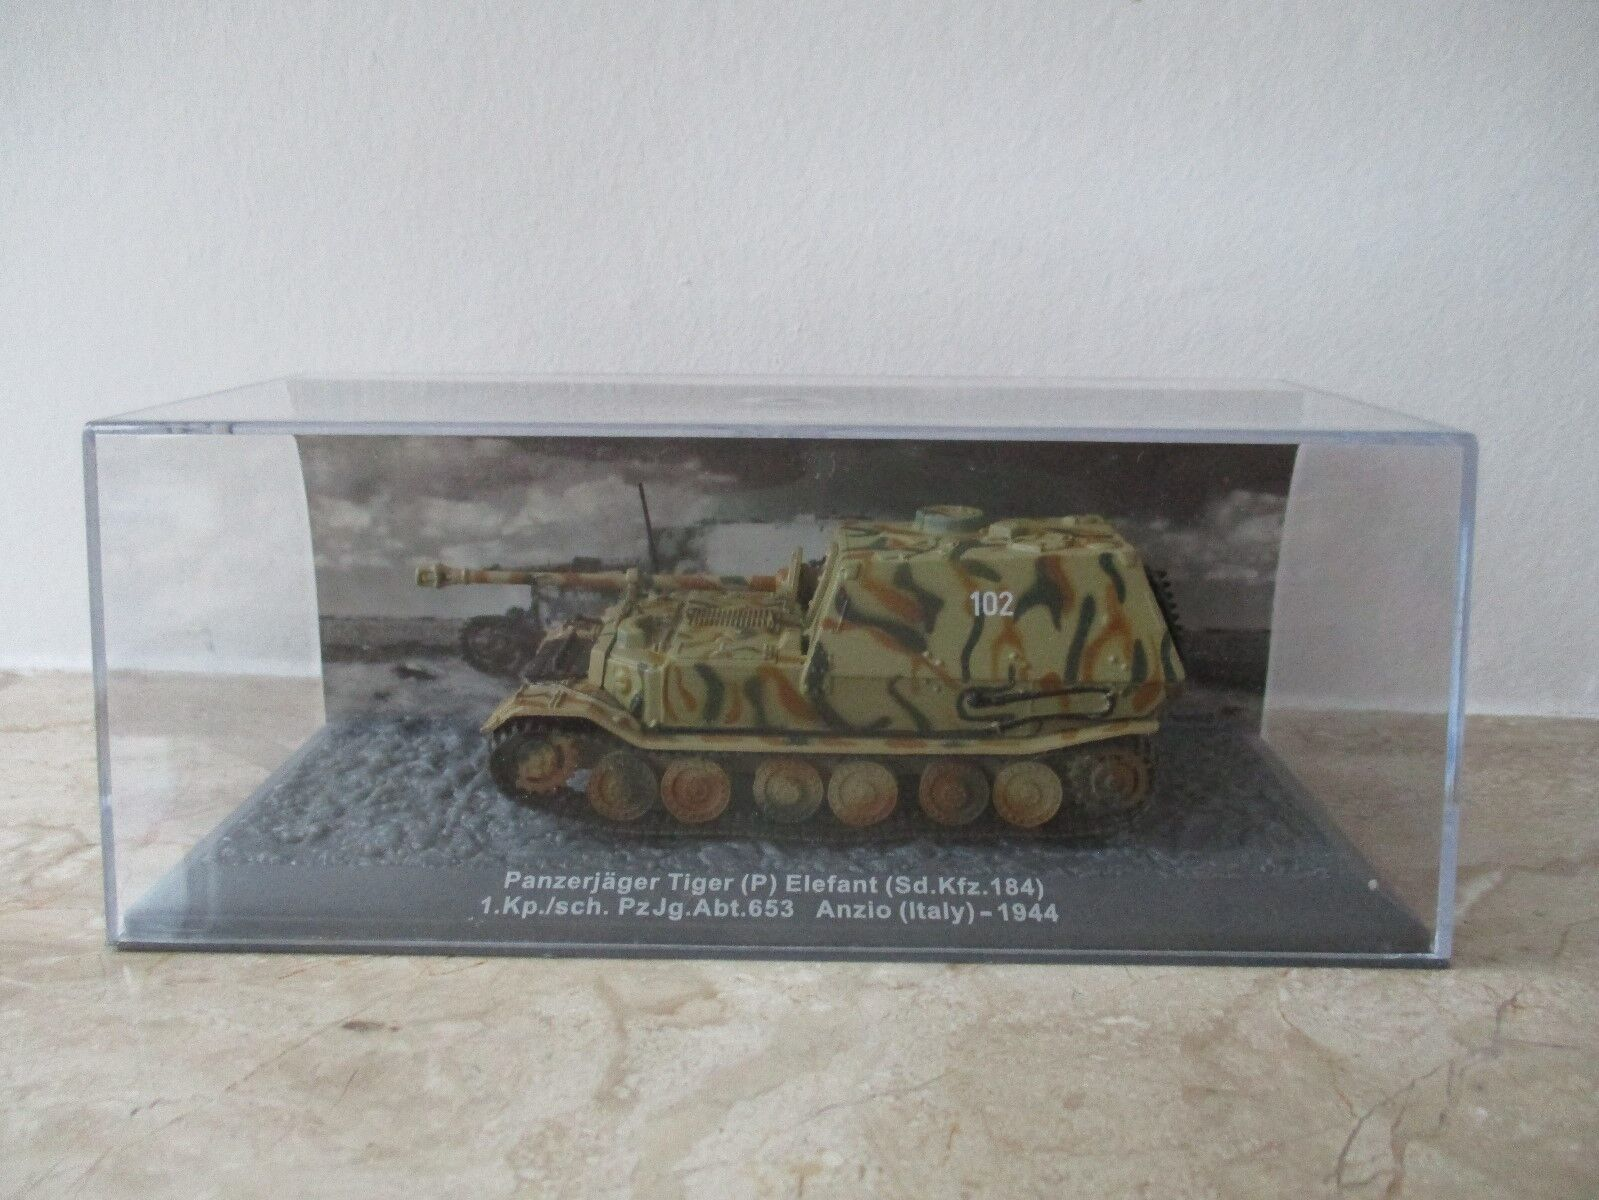 Modellpanzer Panzerjäger Tige(P9 Elefant (Sd.Kfz 184) 1944 Germany Germany Germany Maßstab 1 72 b4ea53